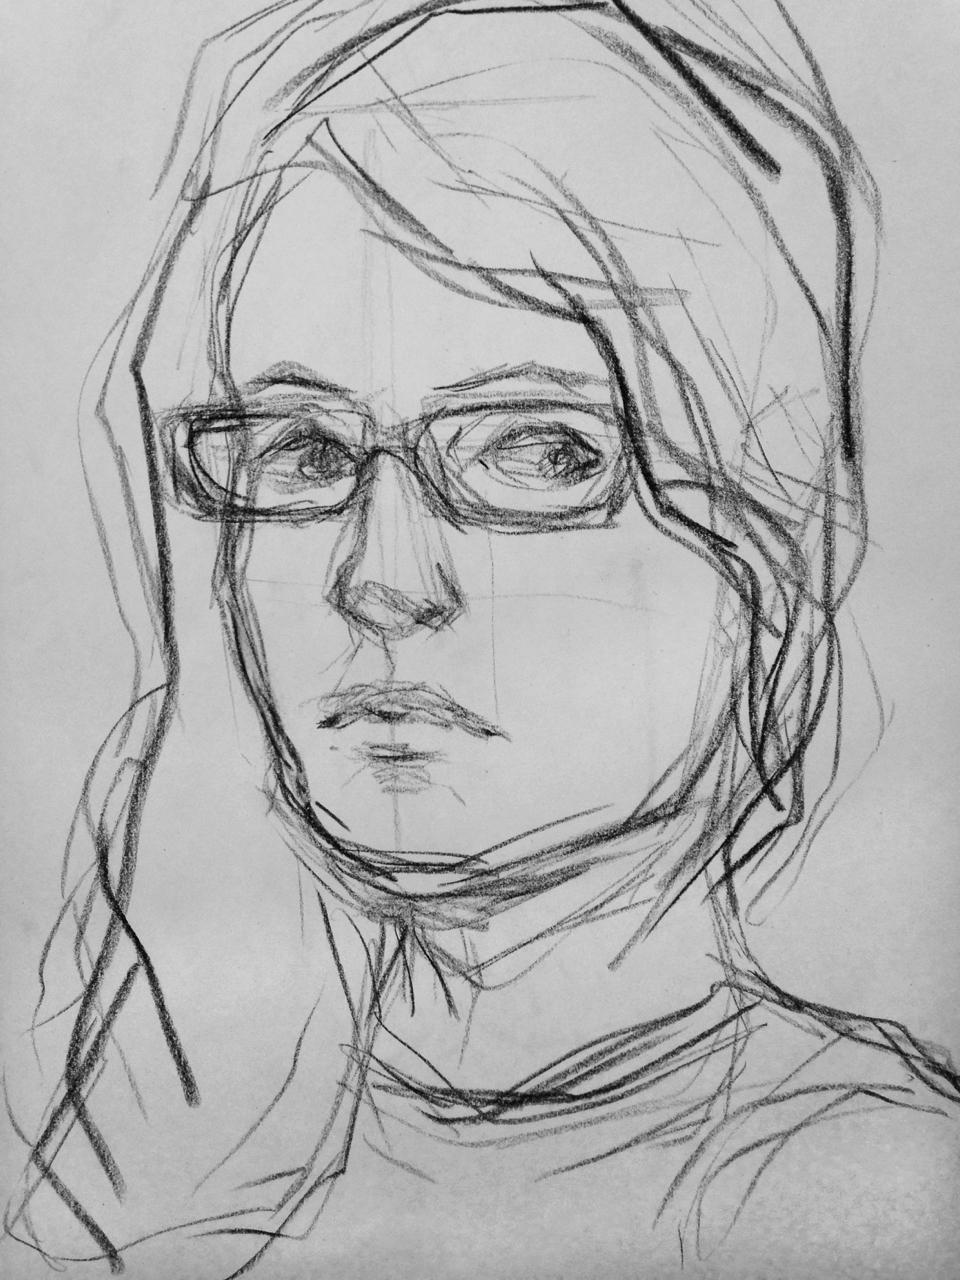 07_cohen_marissa_self_portrait.jpg